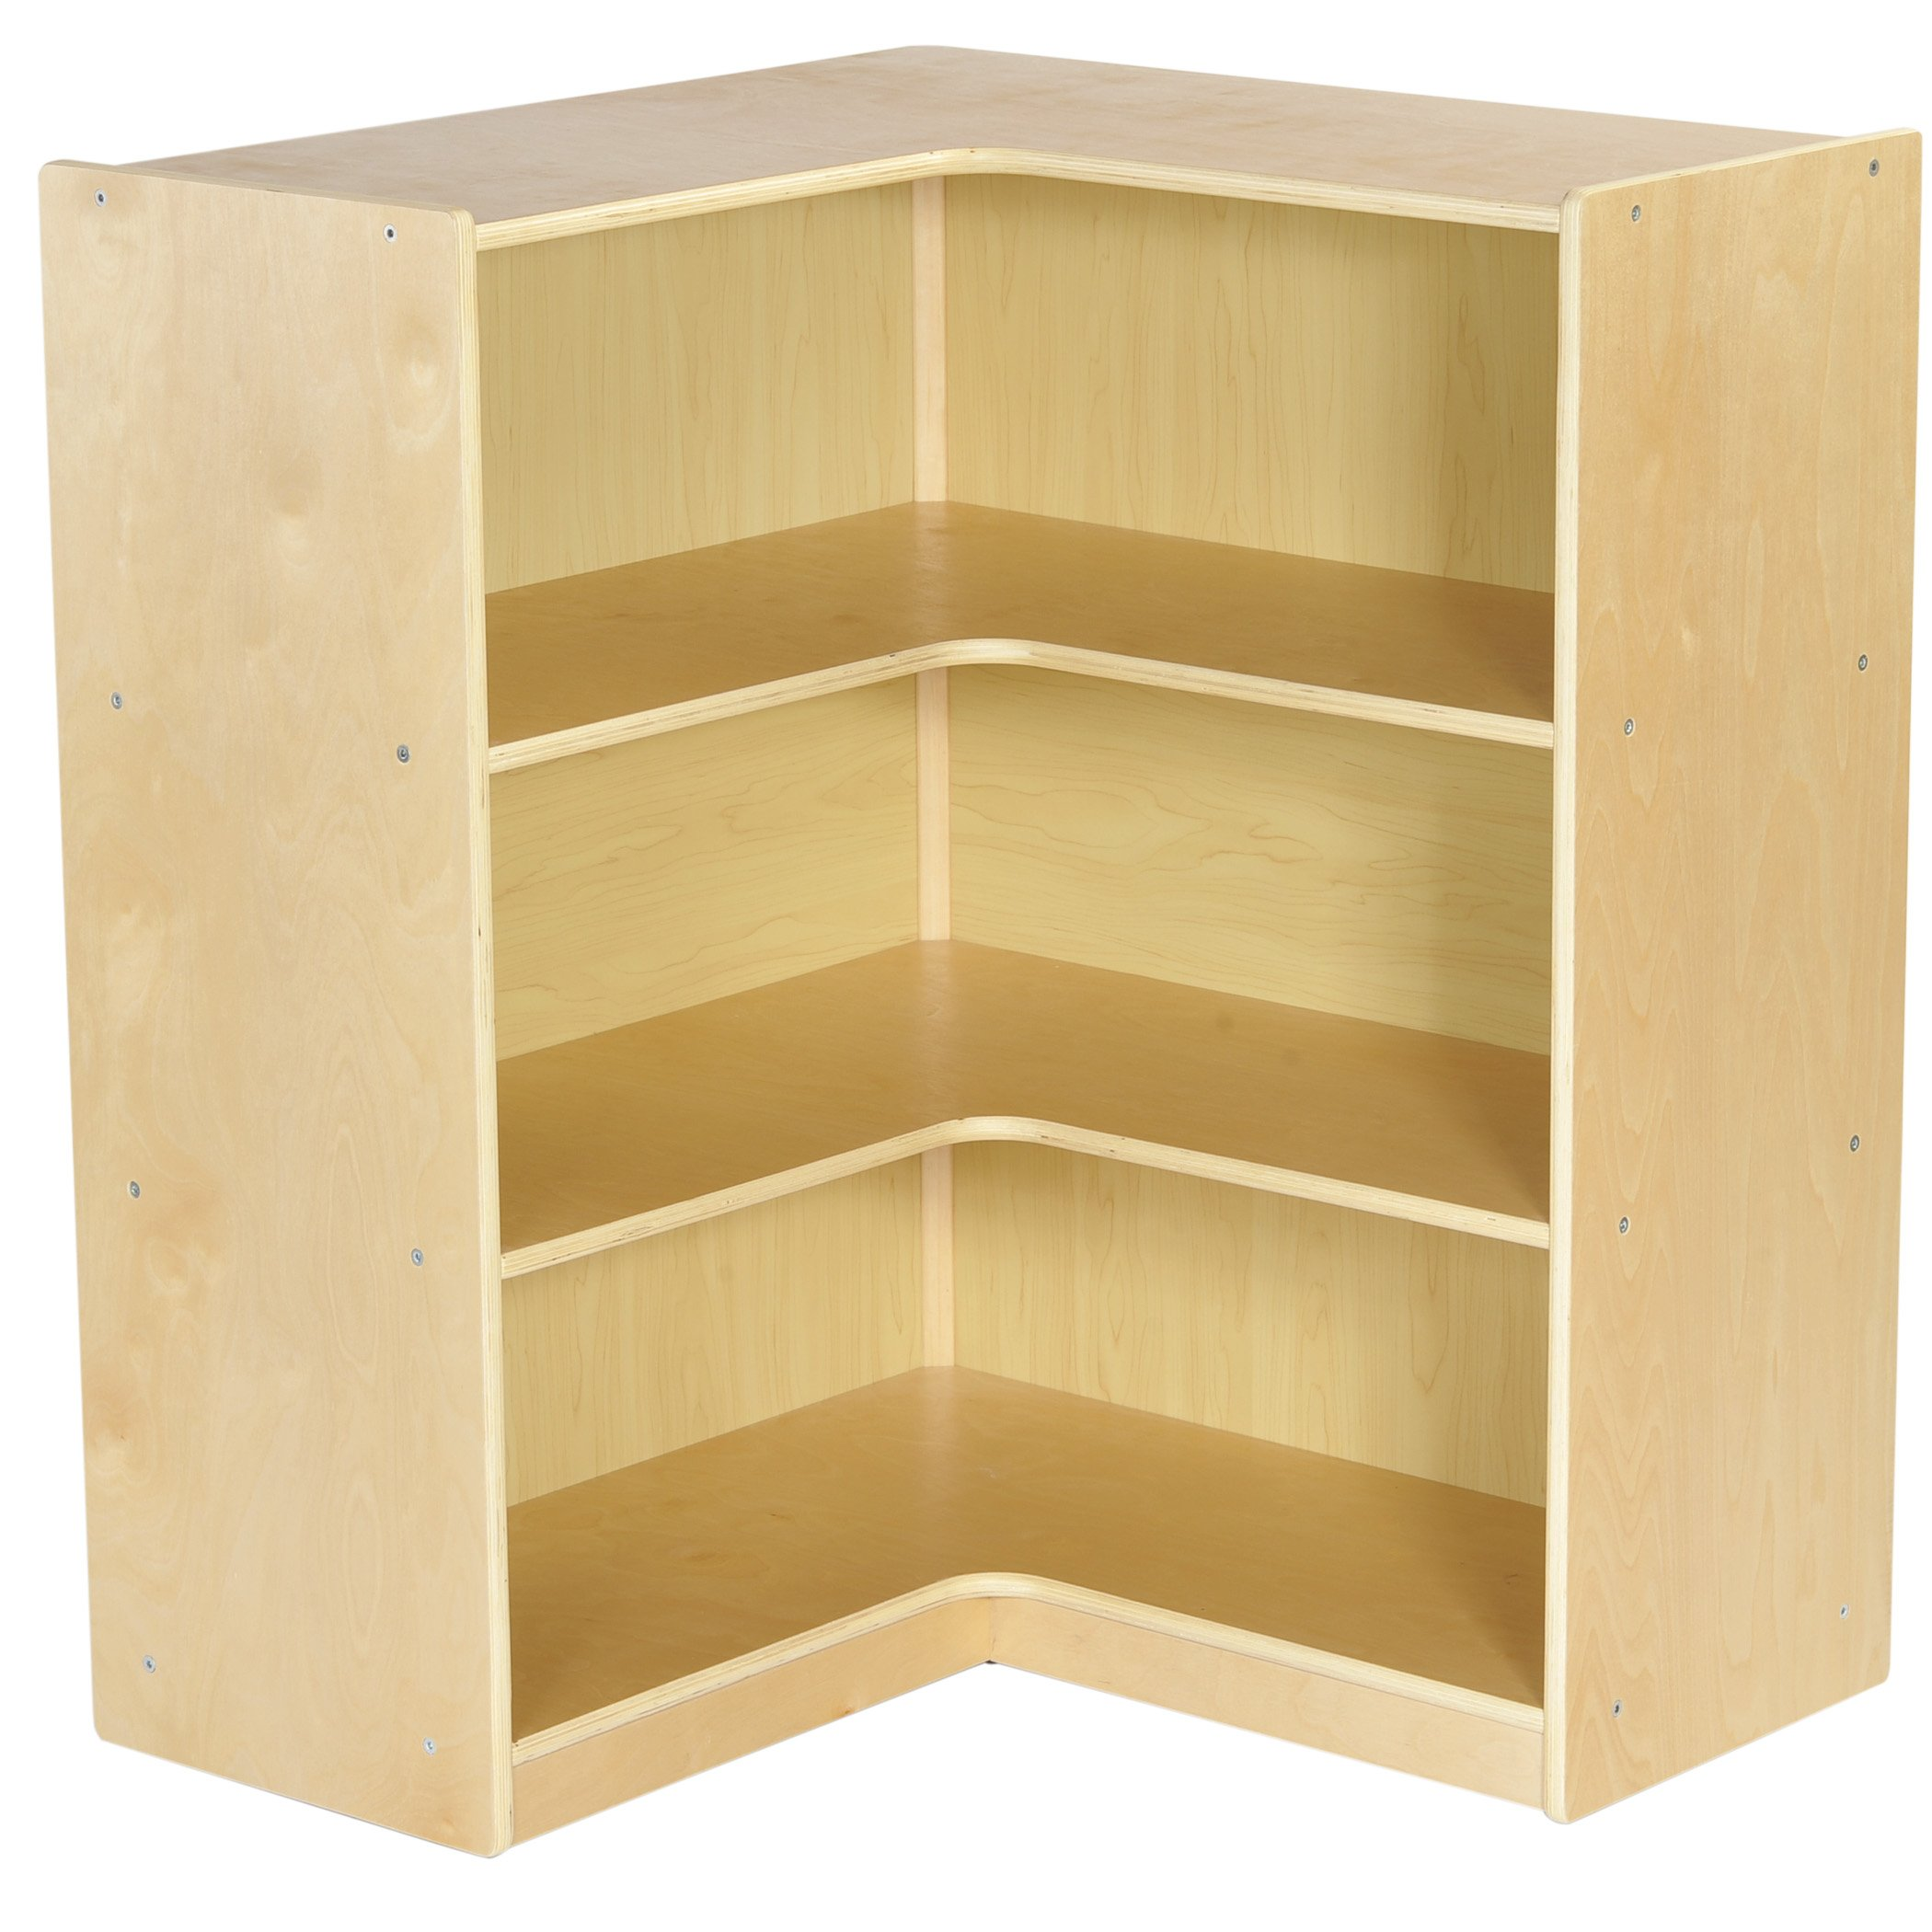 ECR4Kids Birch Corner Classroom Storage Cabinet with Casters, Natural, 36'' H